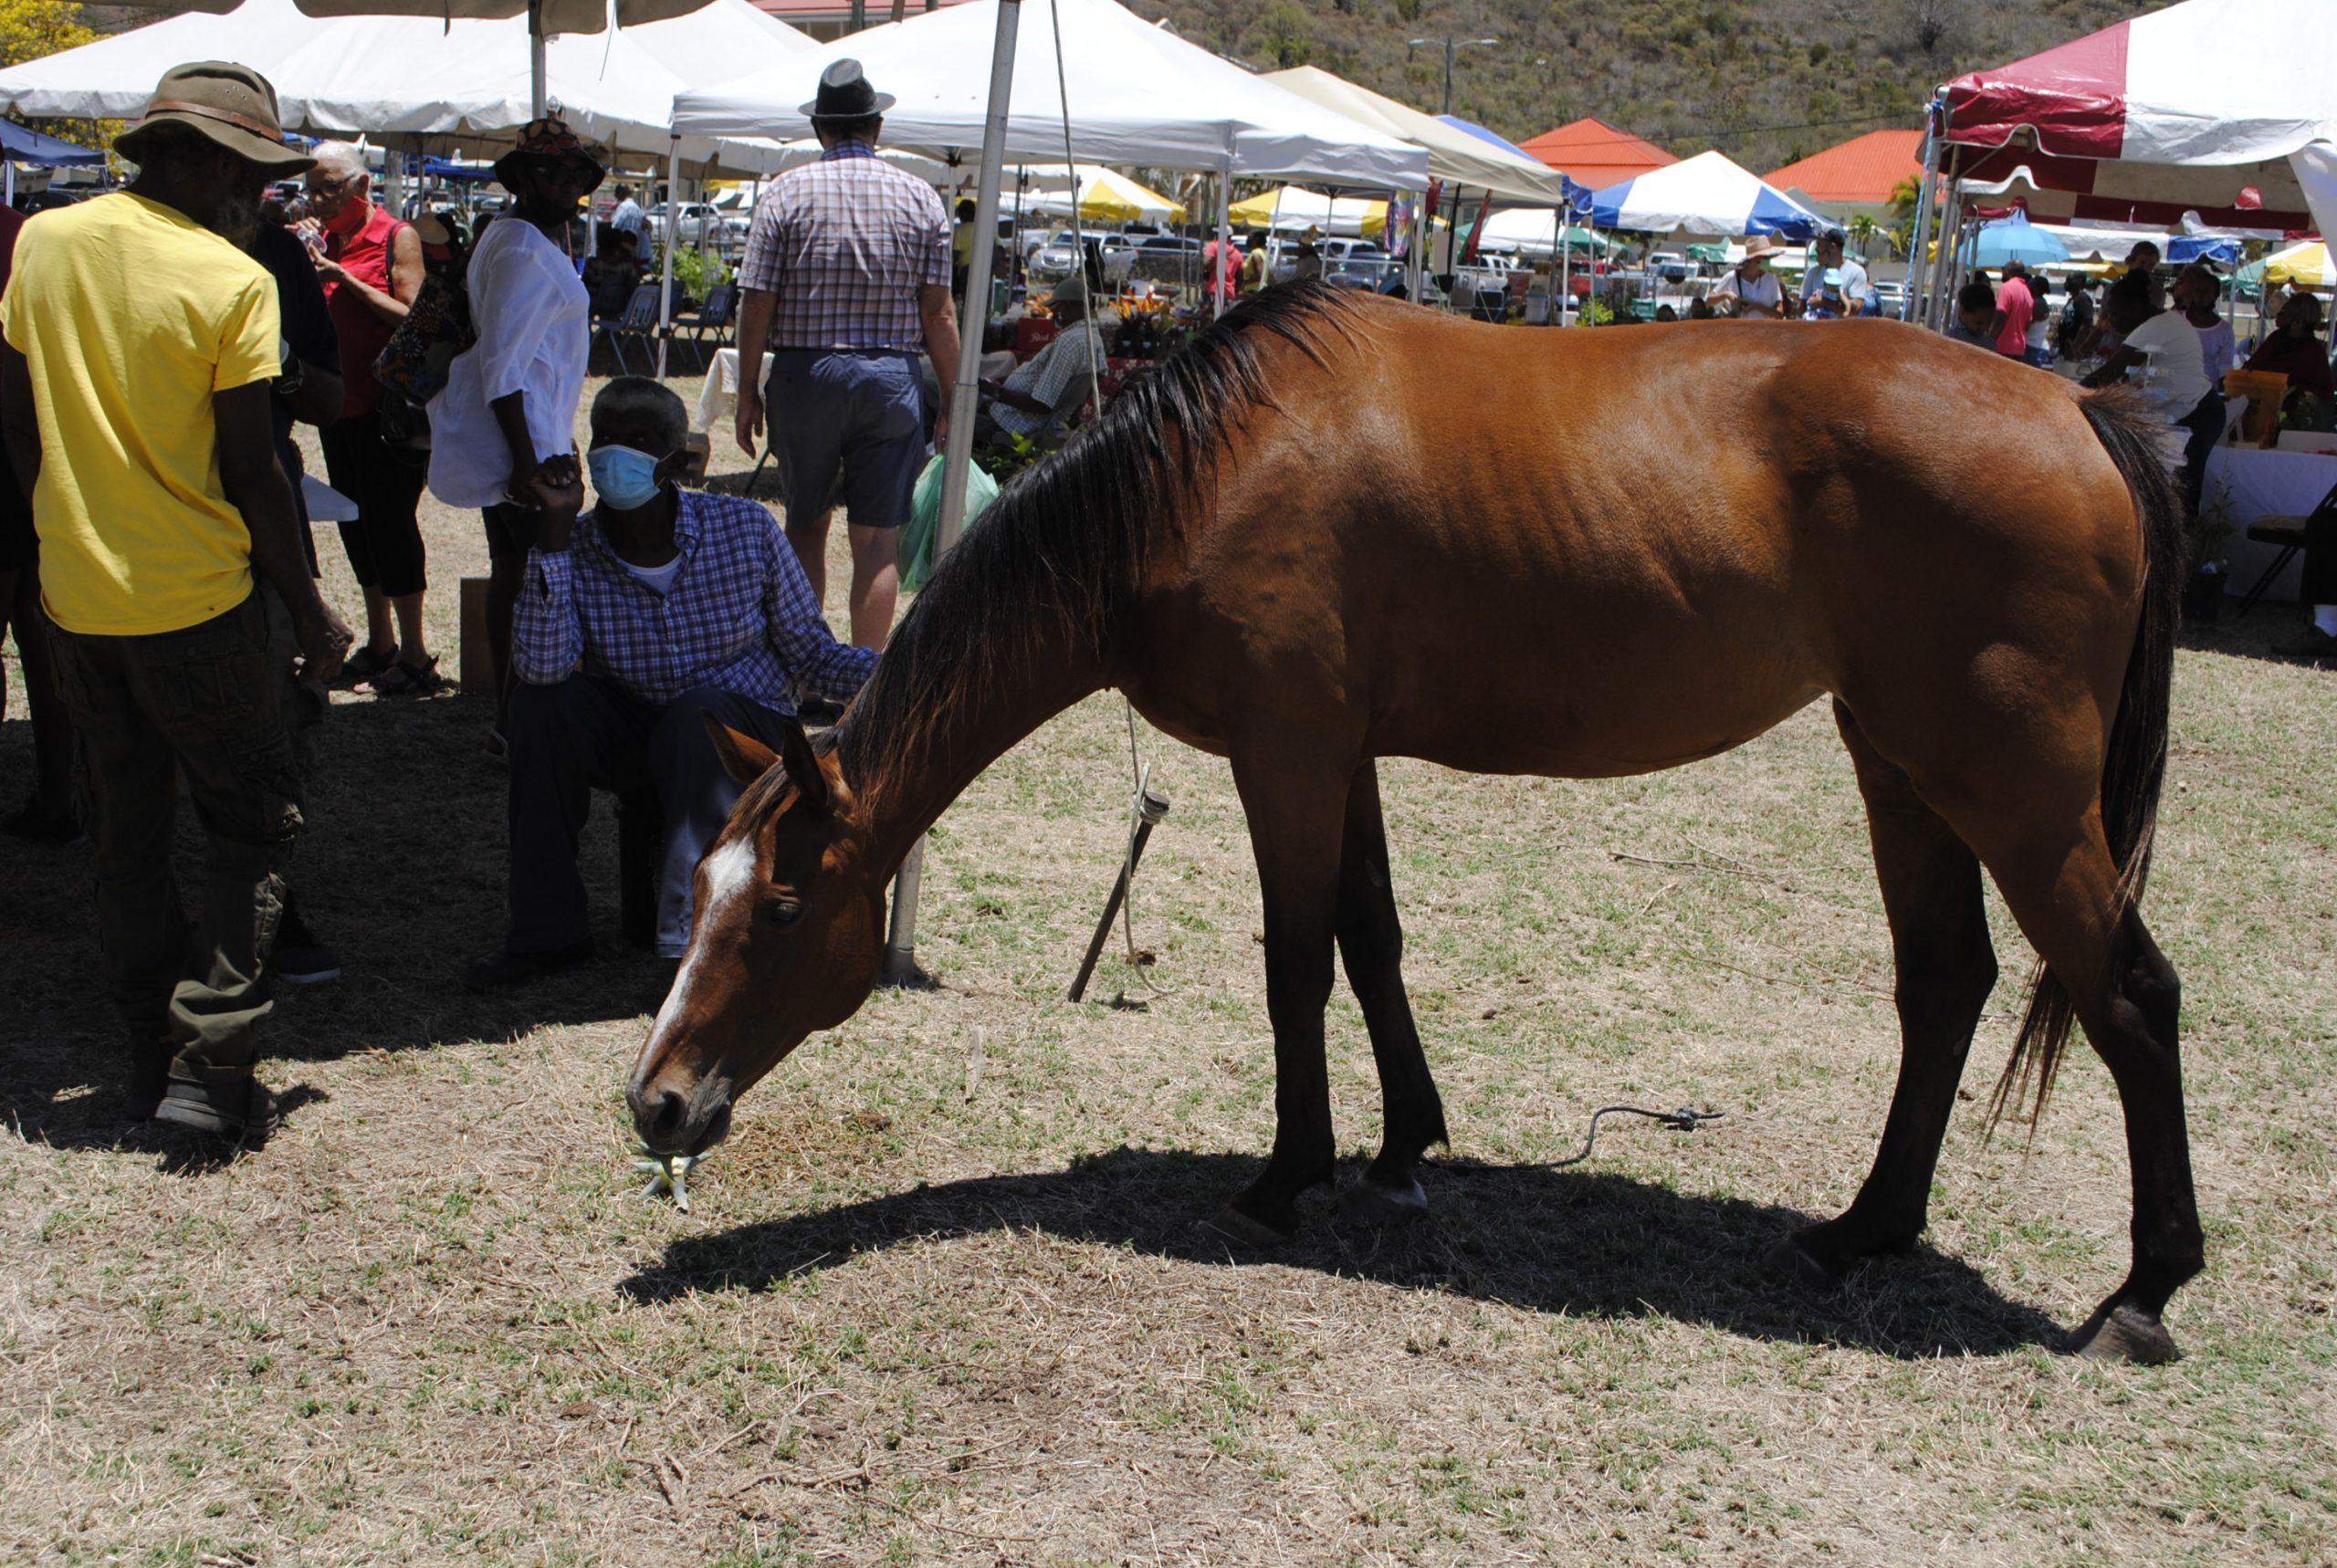 Agriculture Fair & Market Returns to Paraquita Bay!